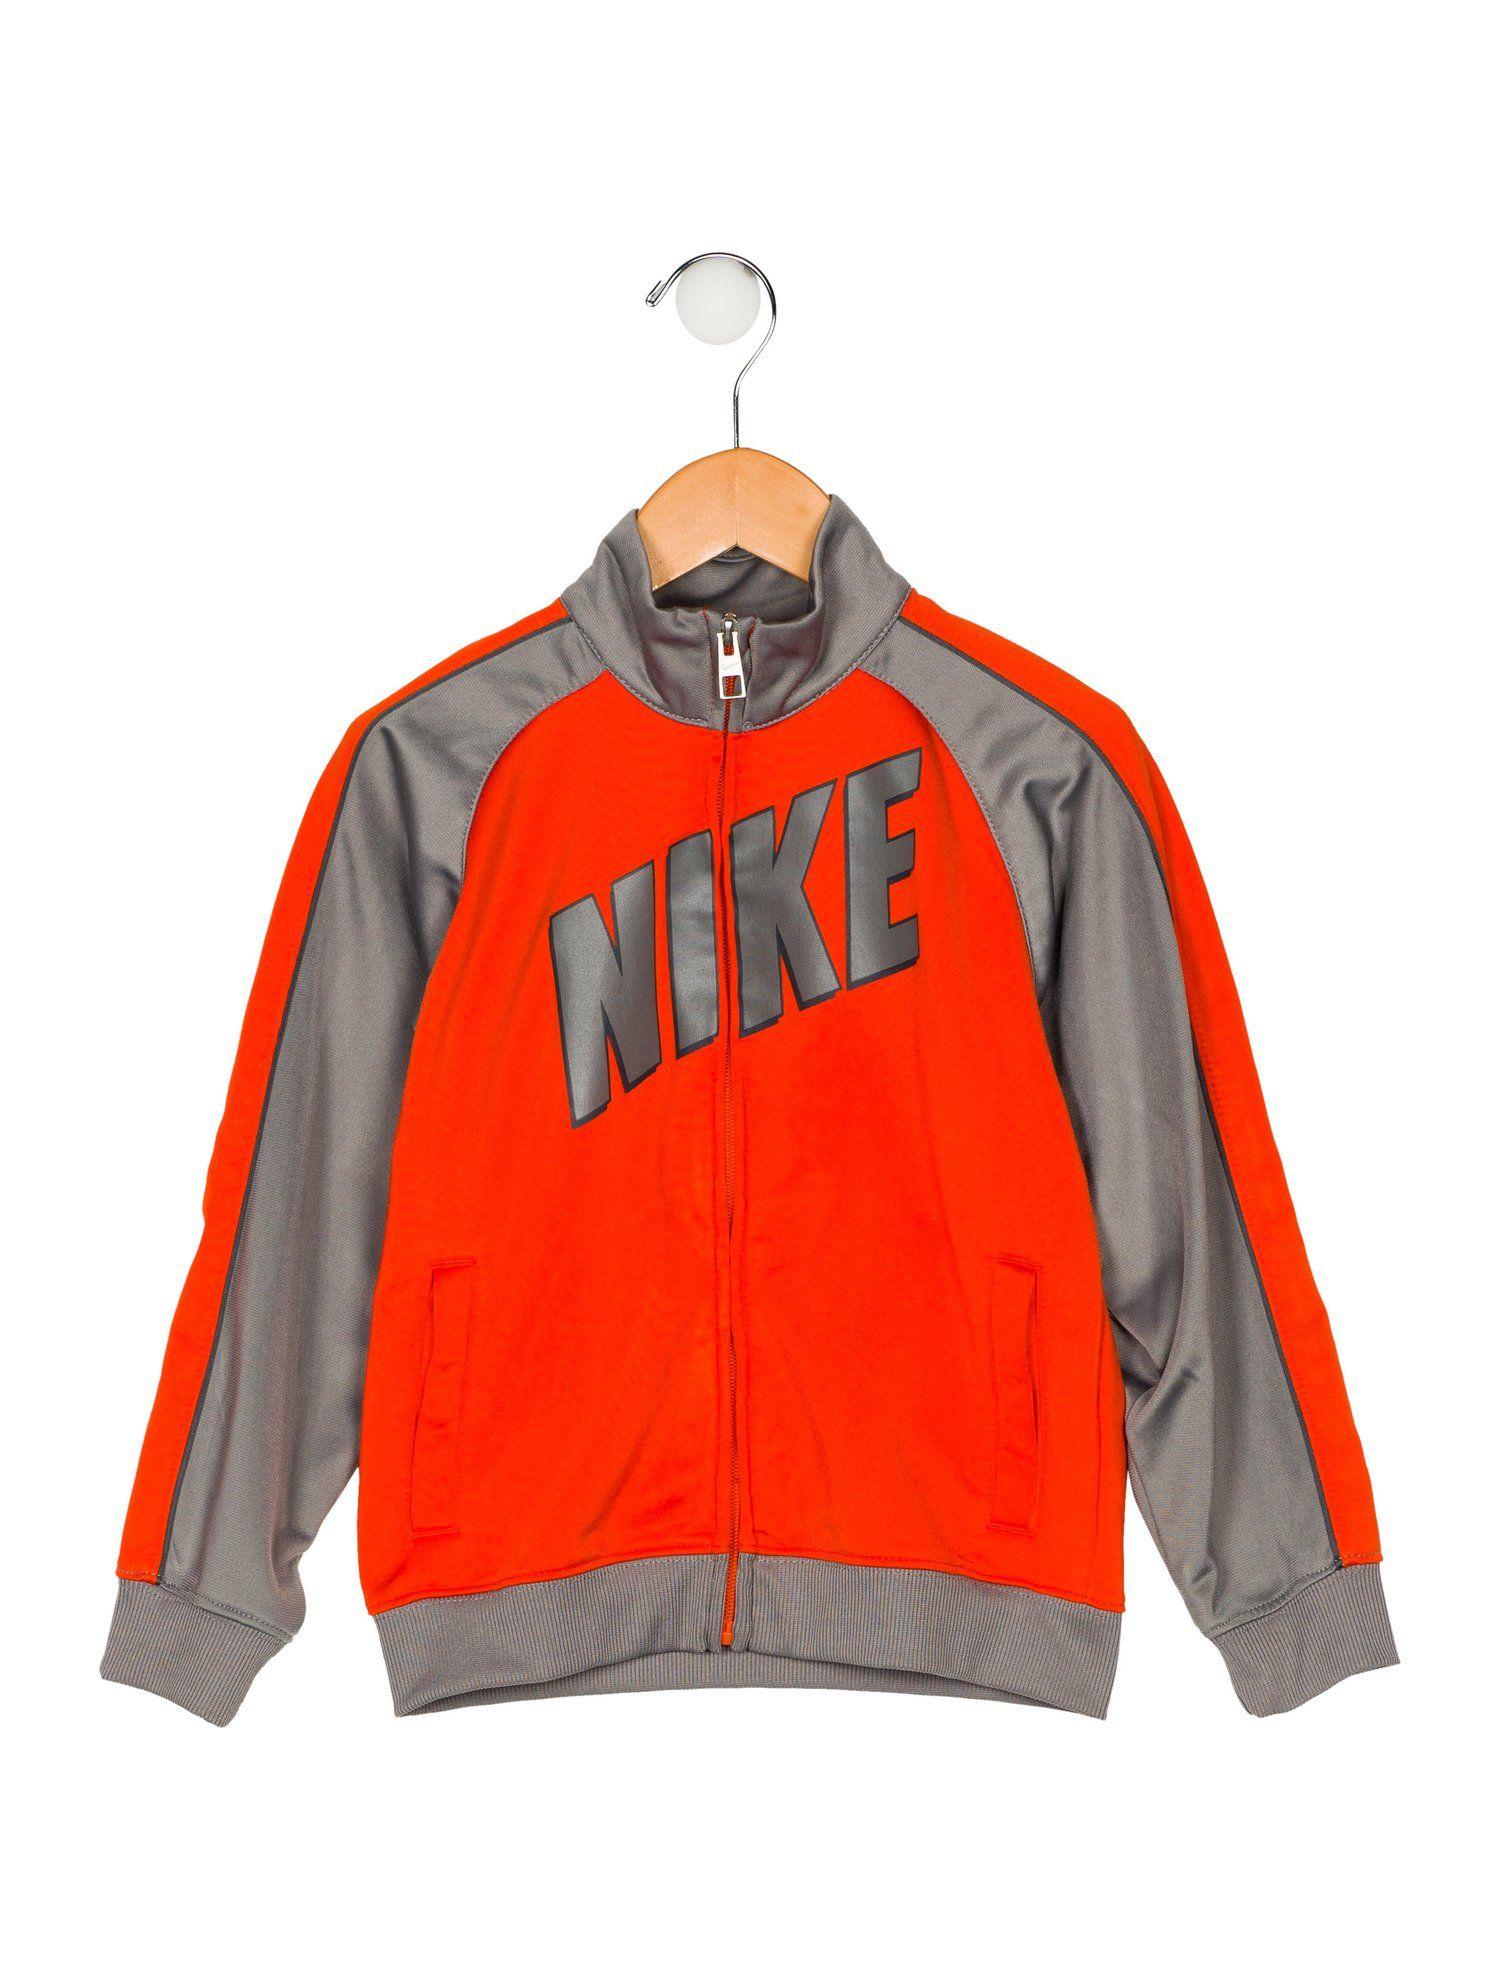 Nike Boys Zip Up Track Jacket Boys Nike Jacket Track Jackets Jackets Mens Outfits [ 1979 x 1500 Pixel ]